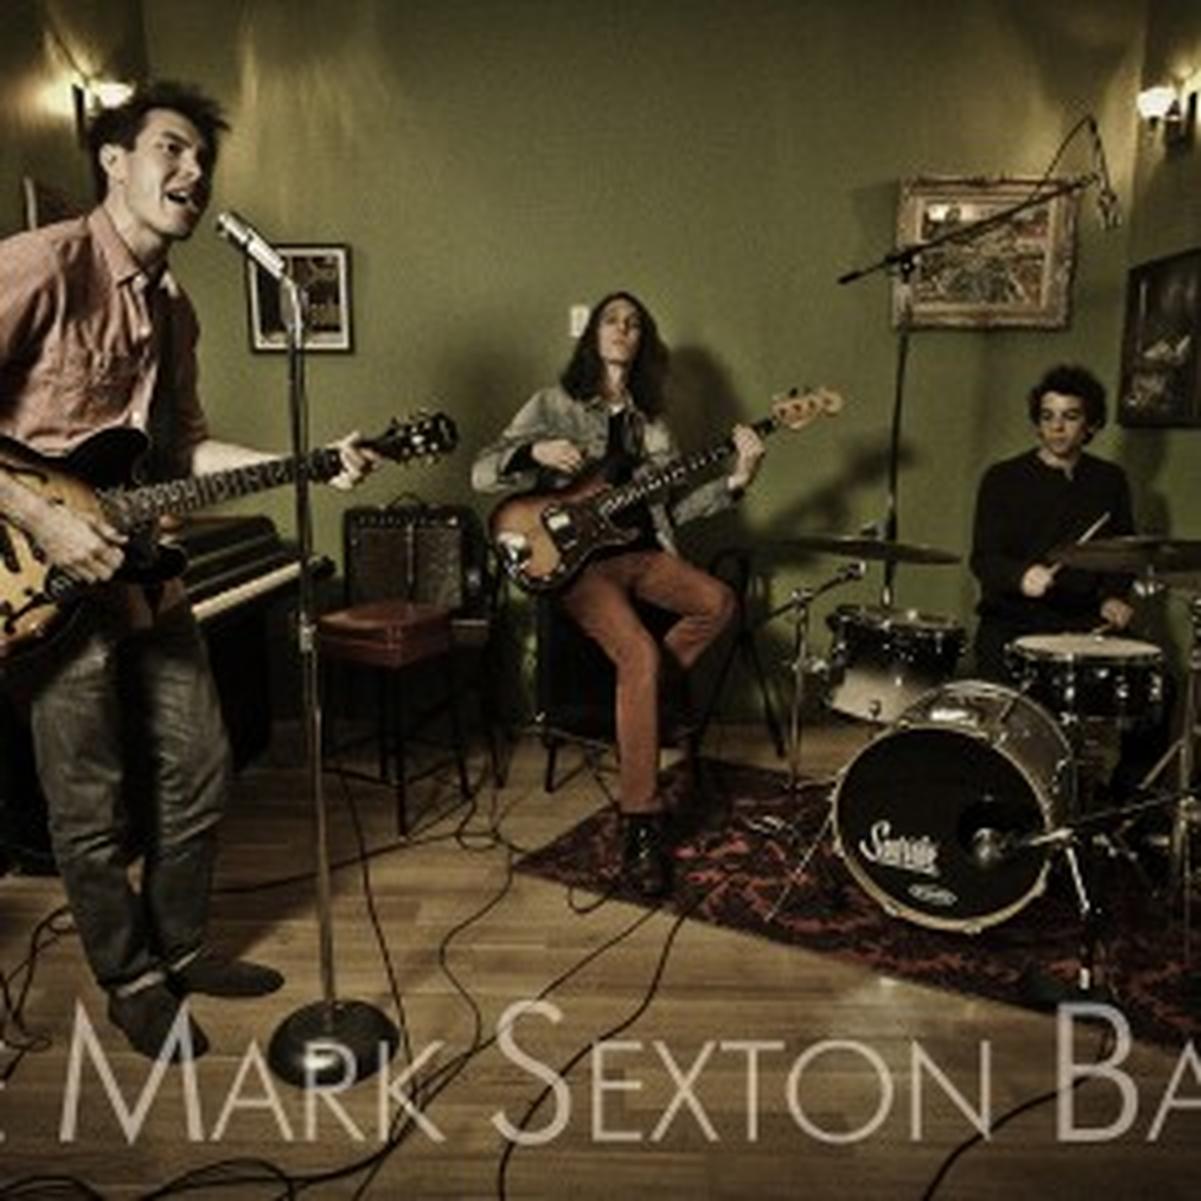 The Mark Sexton Band